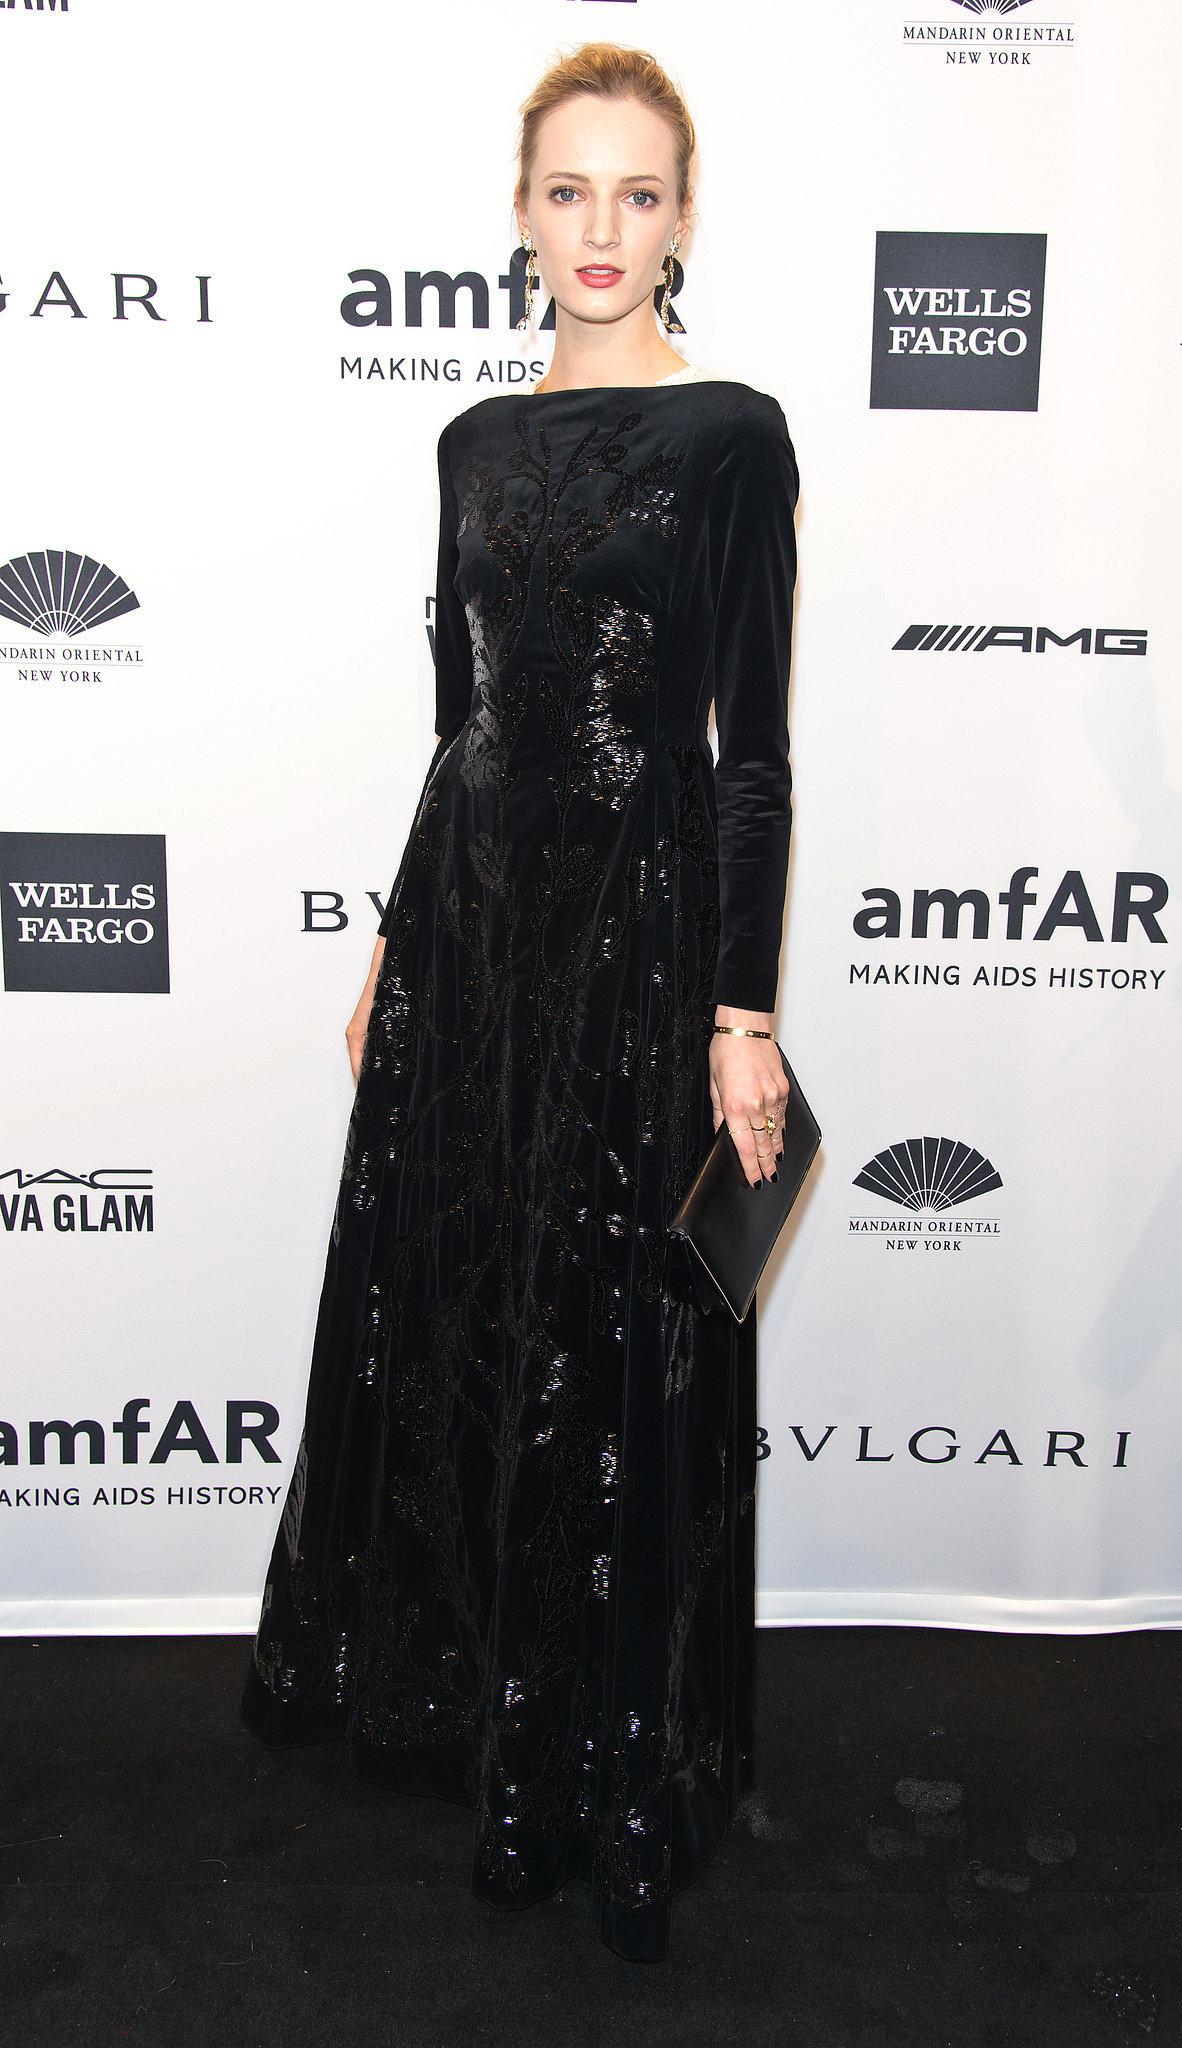 Daria Strokous at amfAR's New York Gala.